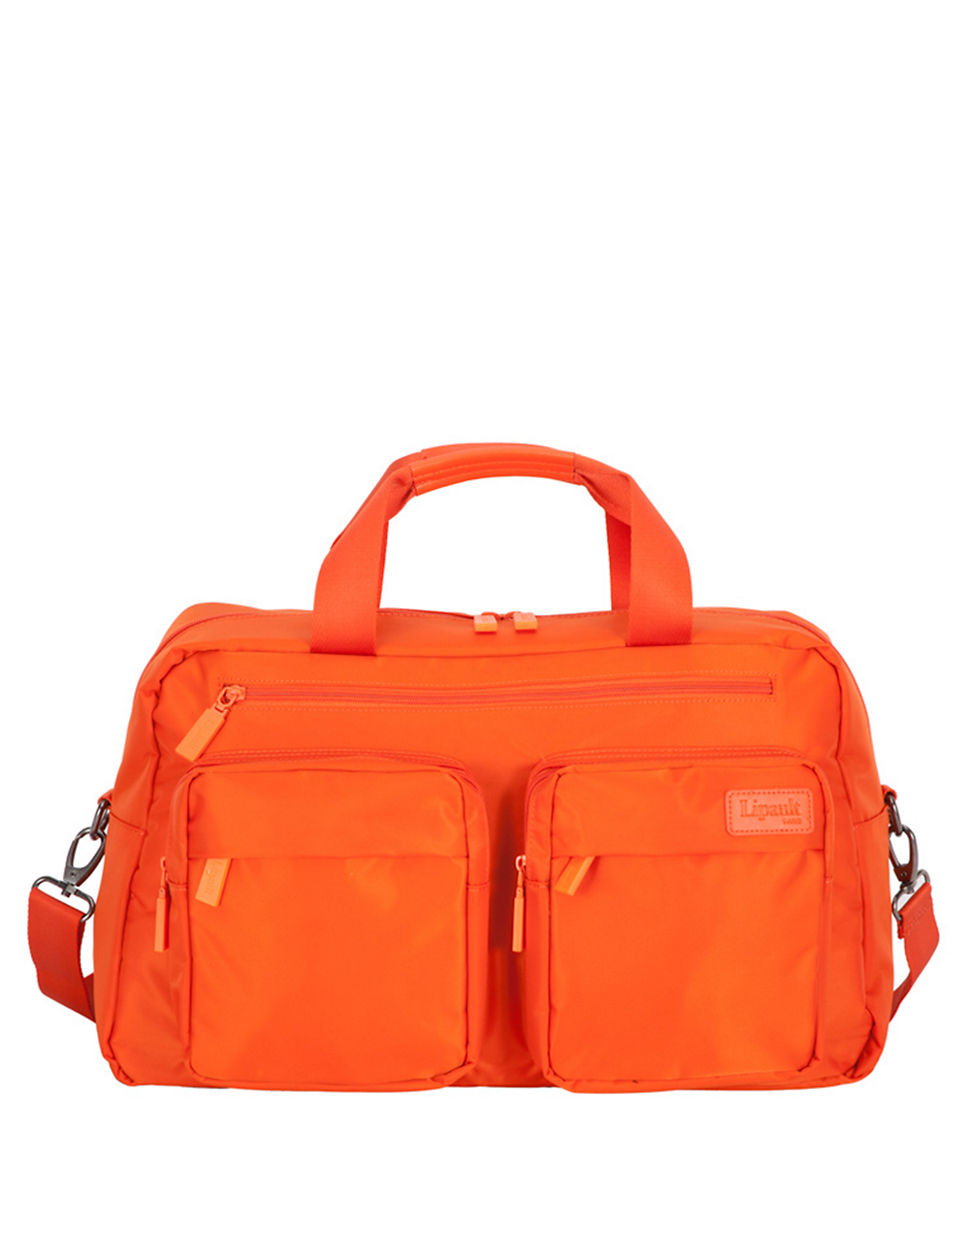 Lipault Plume 0 Percent Foldable 19 Inch Weekend Shoulder Bag in ...